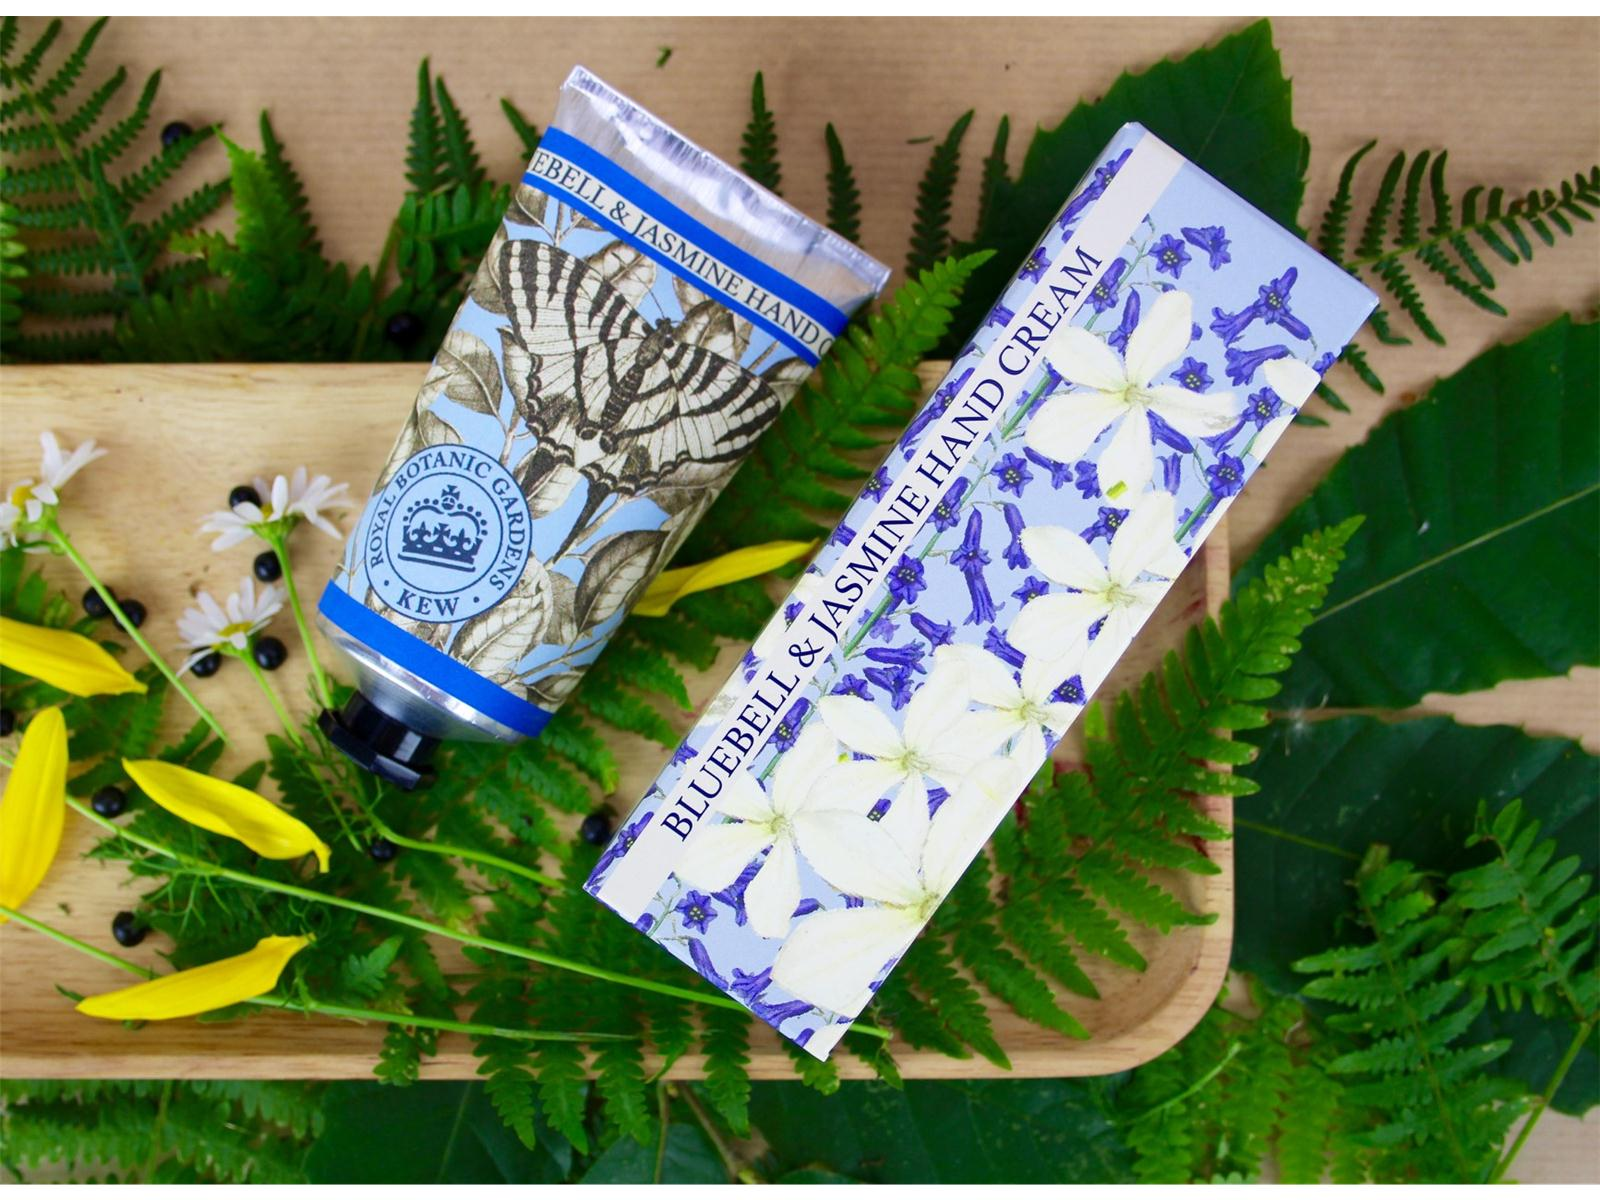 Kew Handcreme Bluebell & Jasmine/ Glockenblume, 75 ml